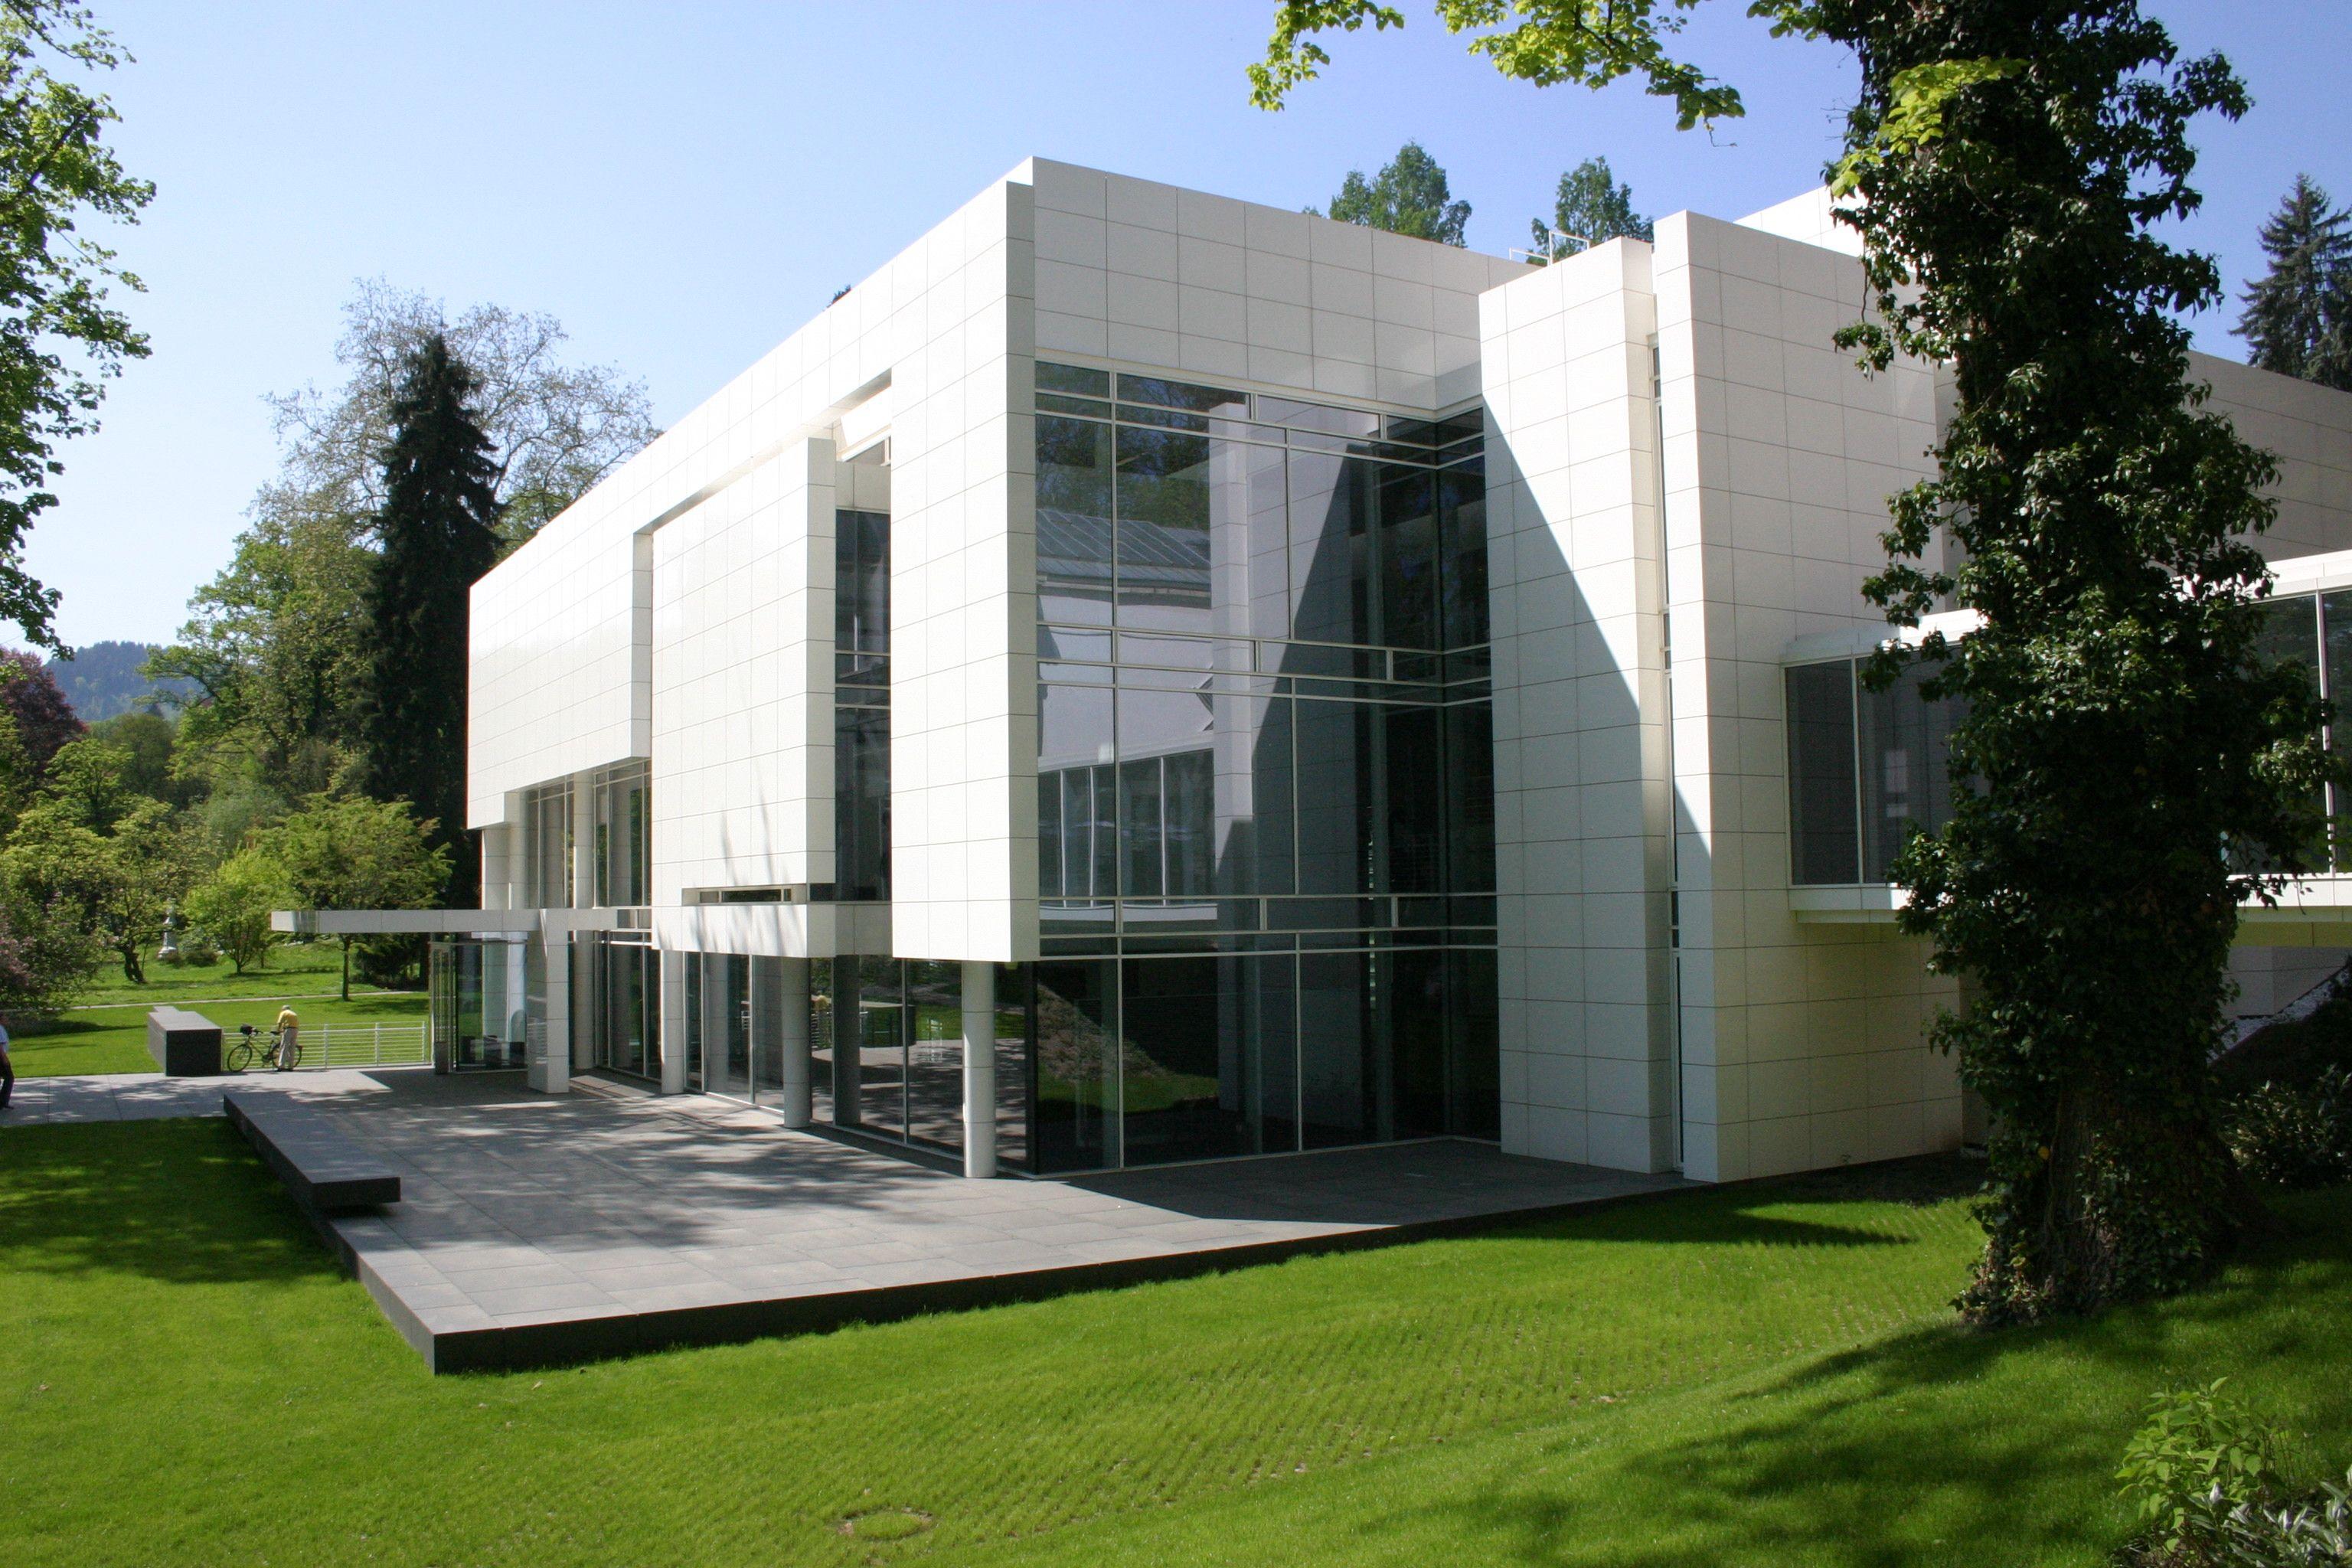 Museum Frieder Burda, Baden-Baden - Google Search